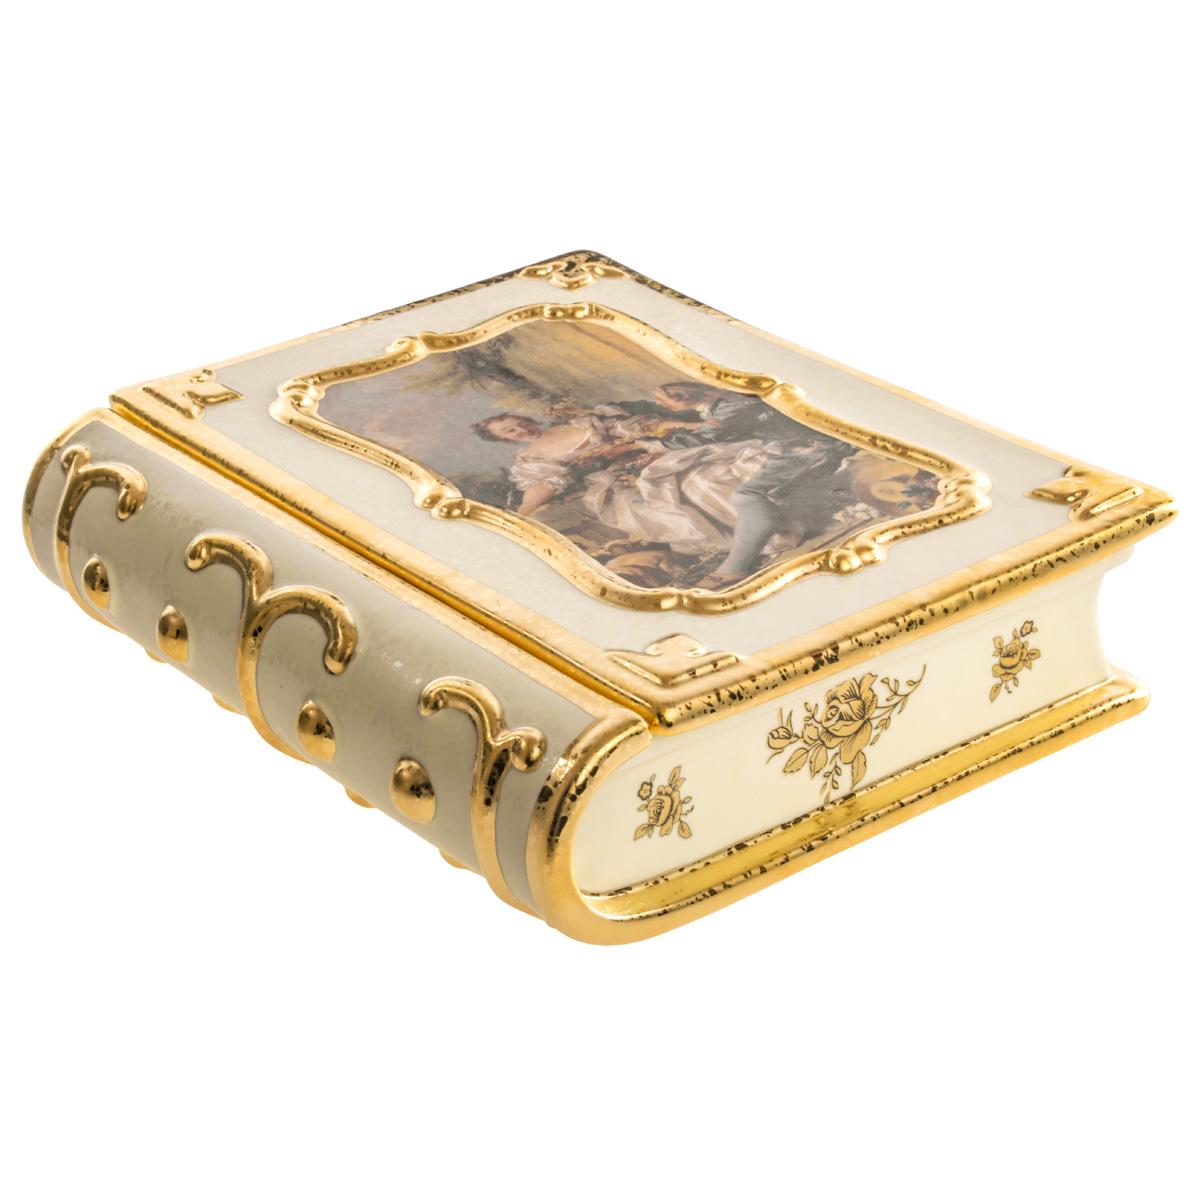 Статуэтка ceramiche (bruno costenaro) золотой.